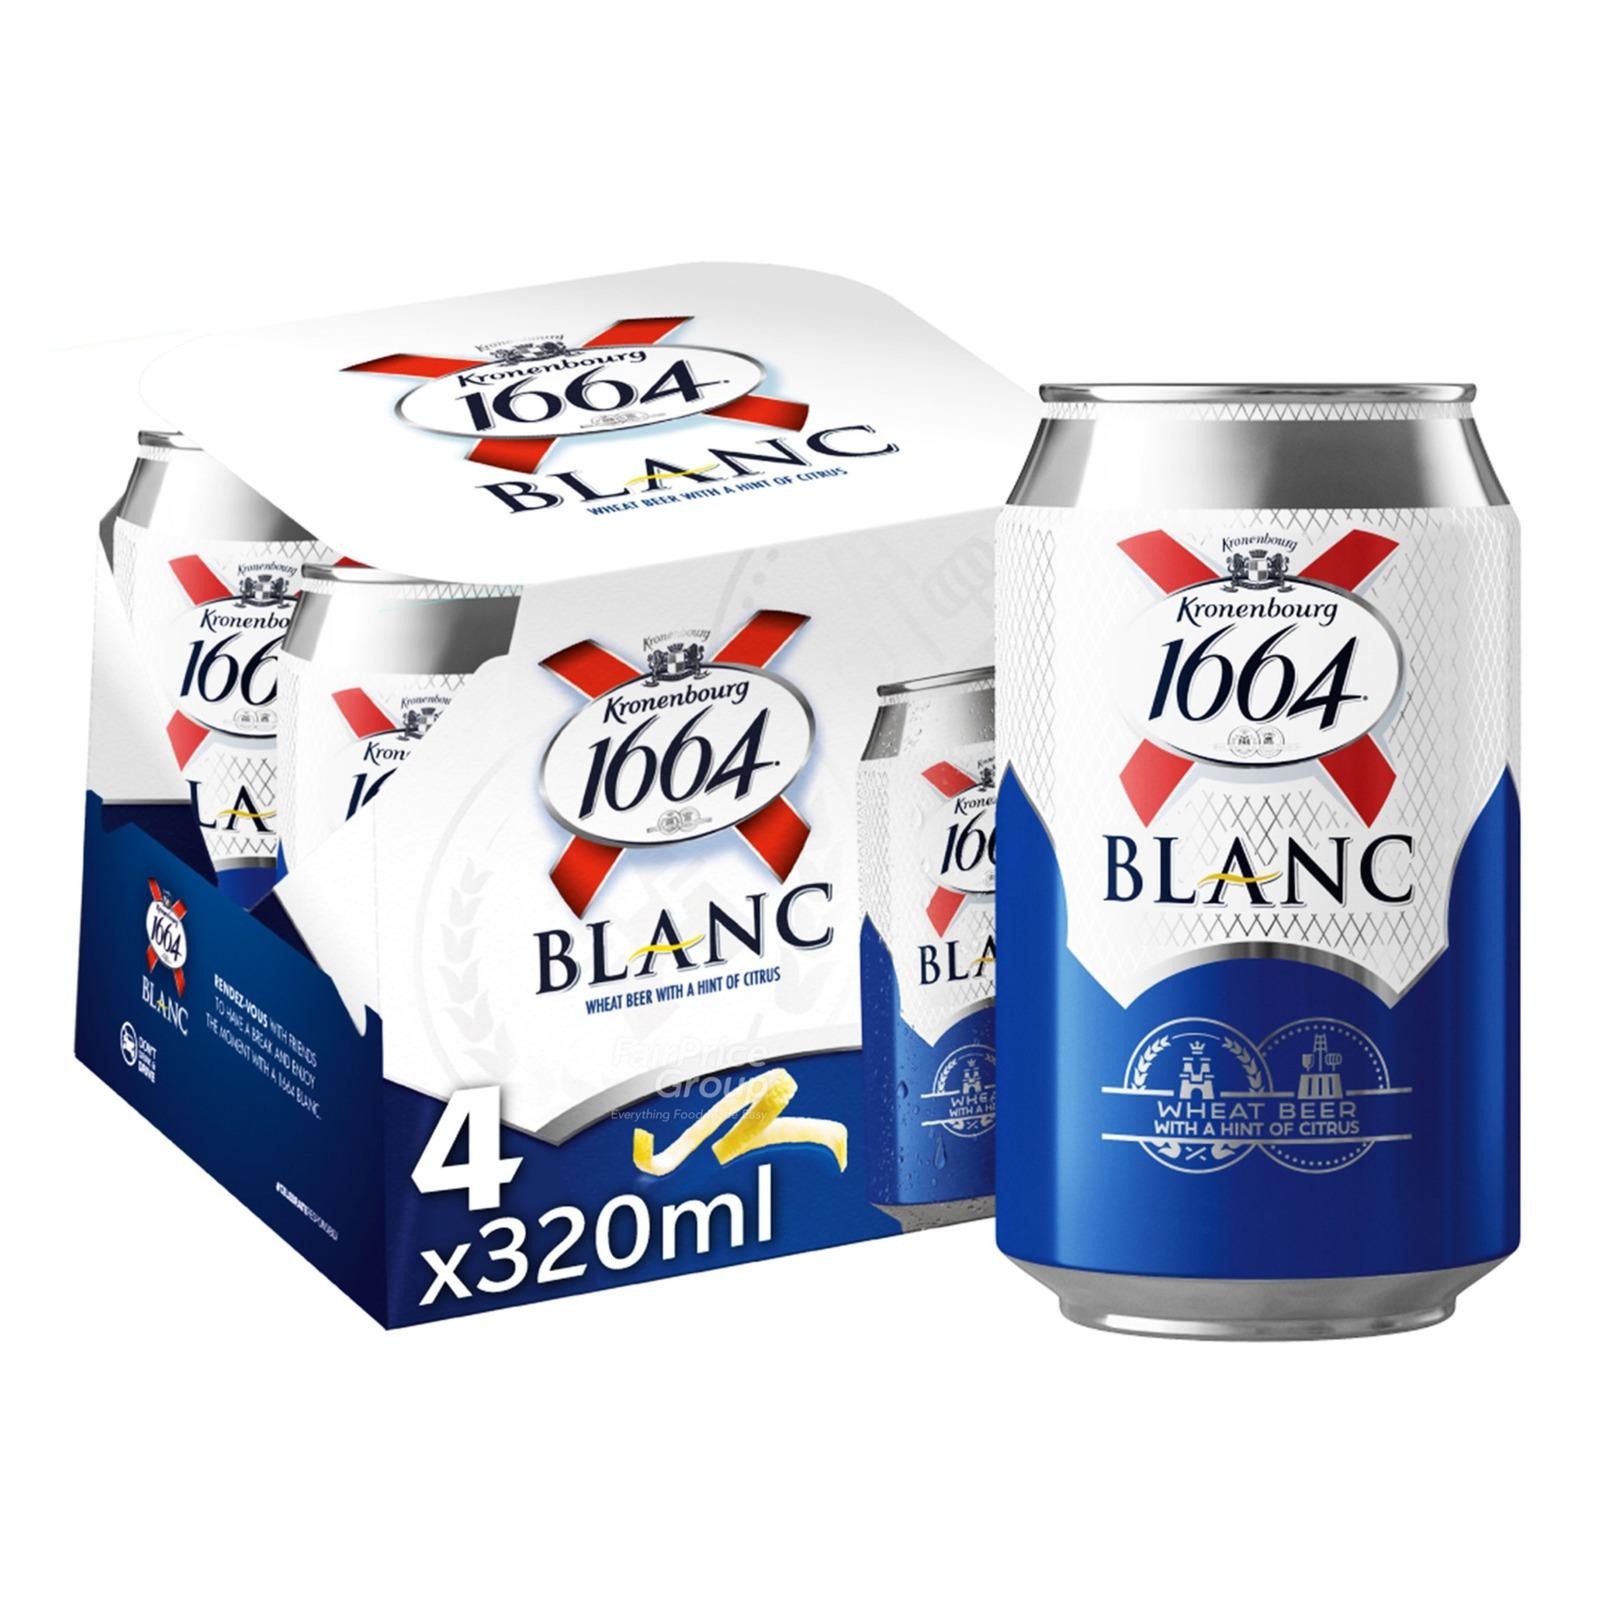 Kronenbourg 1664 Can Beer - Blanc